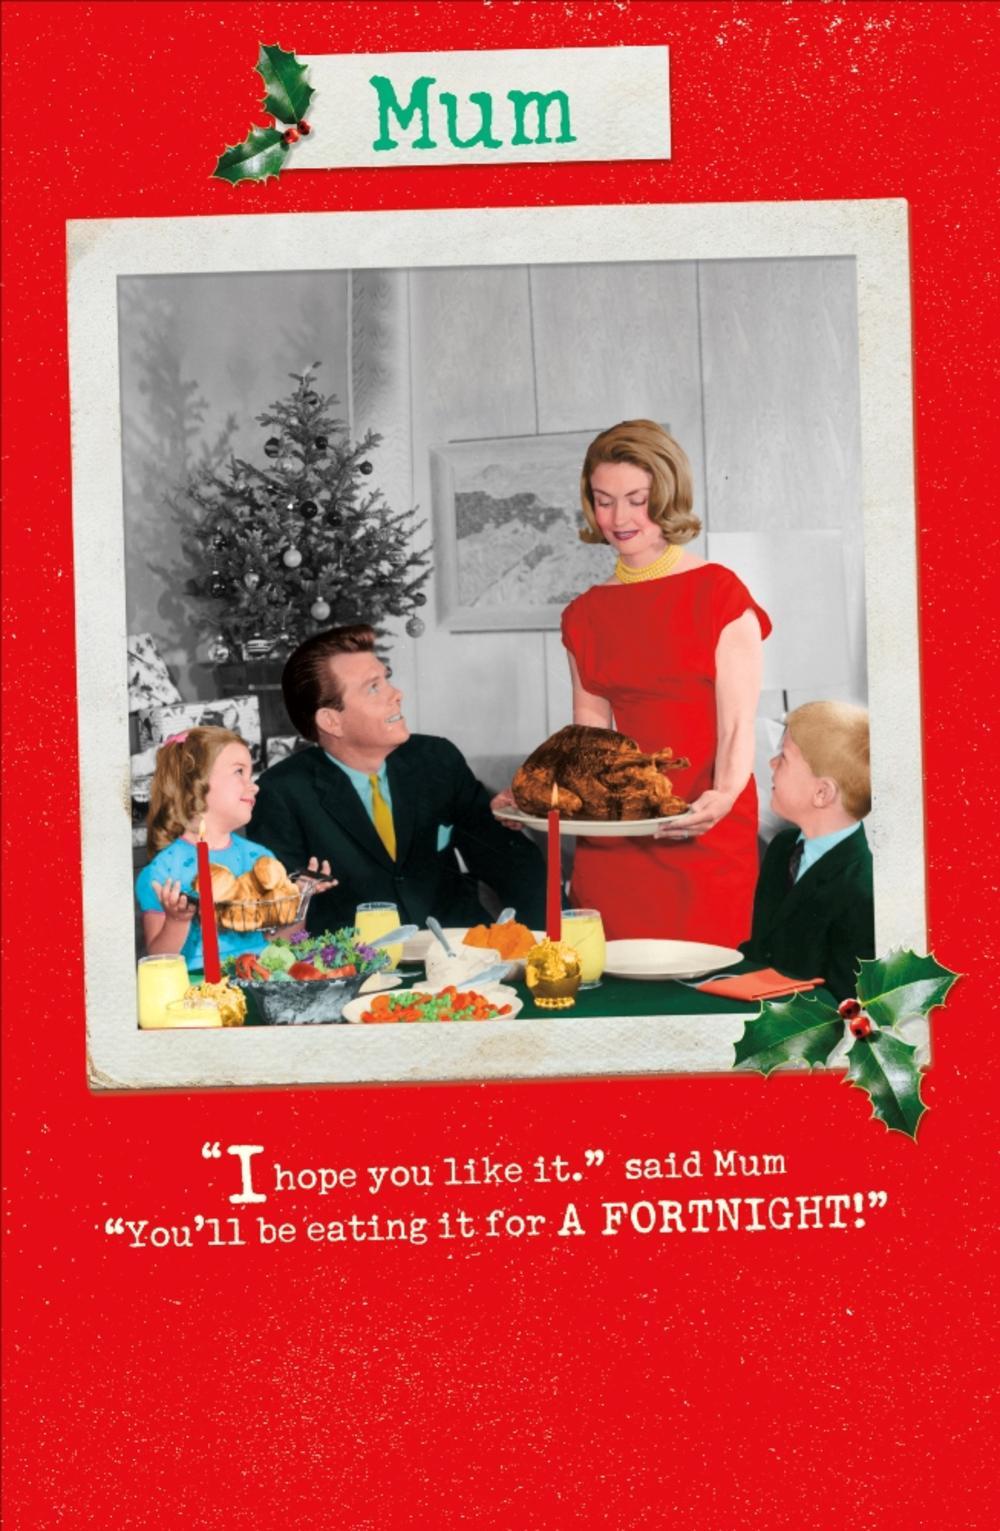 Mum Funny Retro Christmas Greeting Card